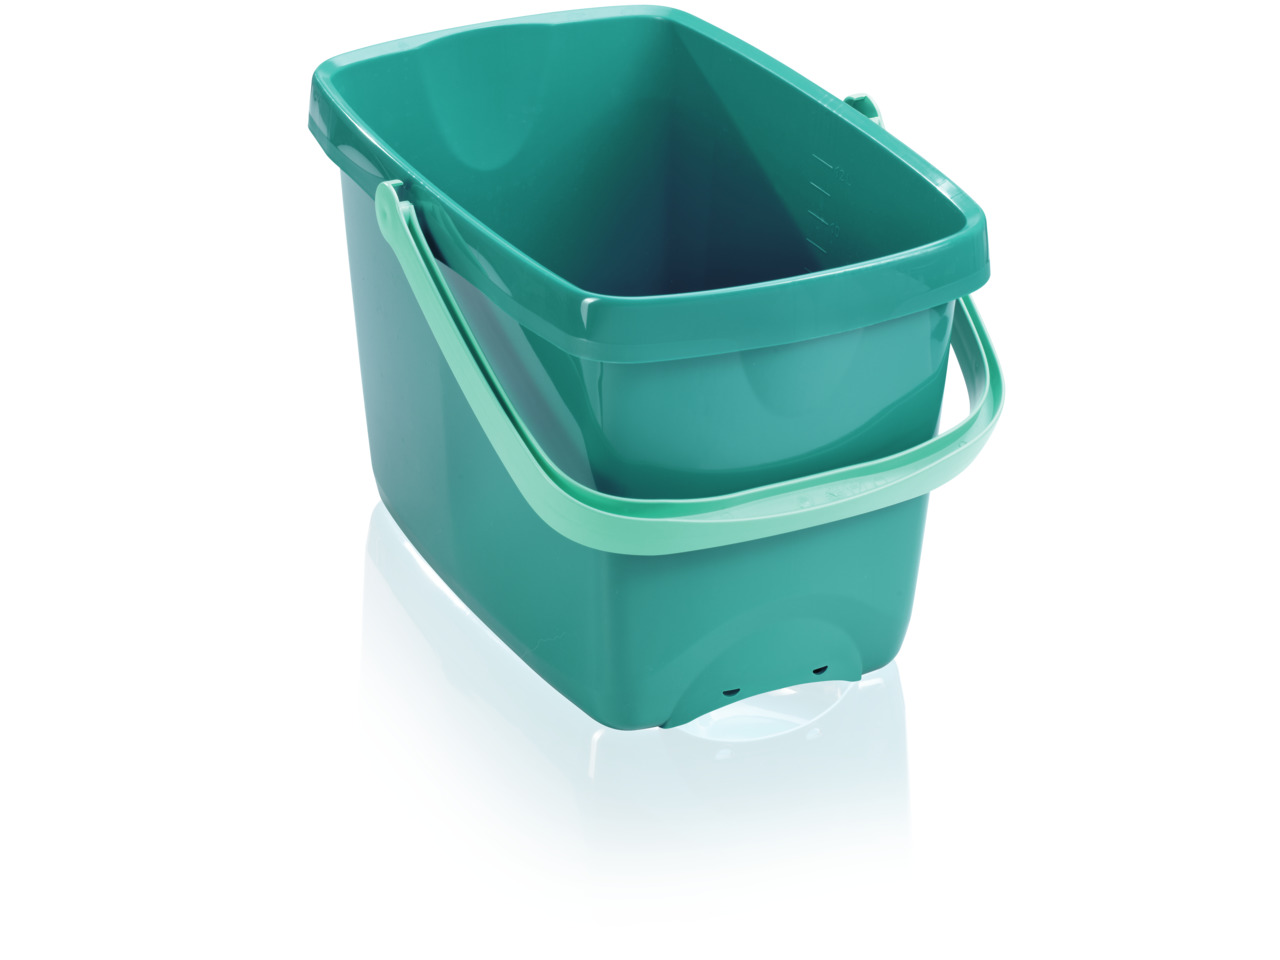 LEIFHEIT 52000 Bucket Combi